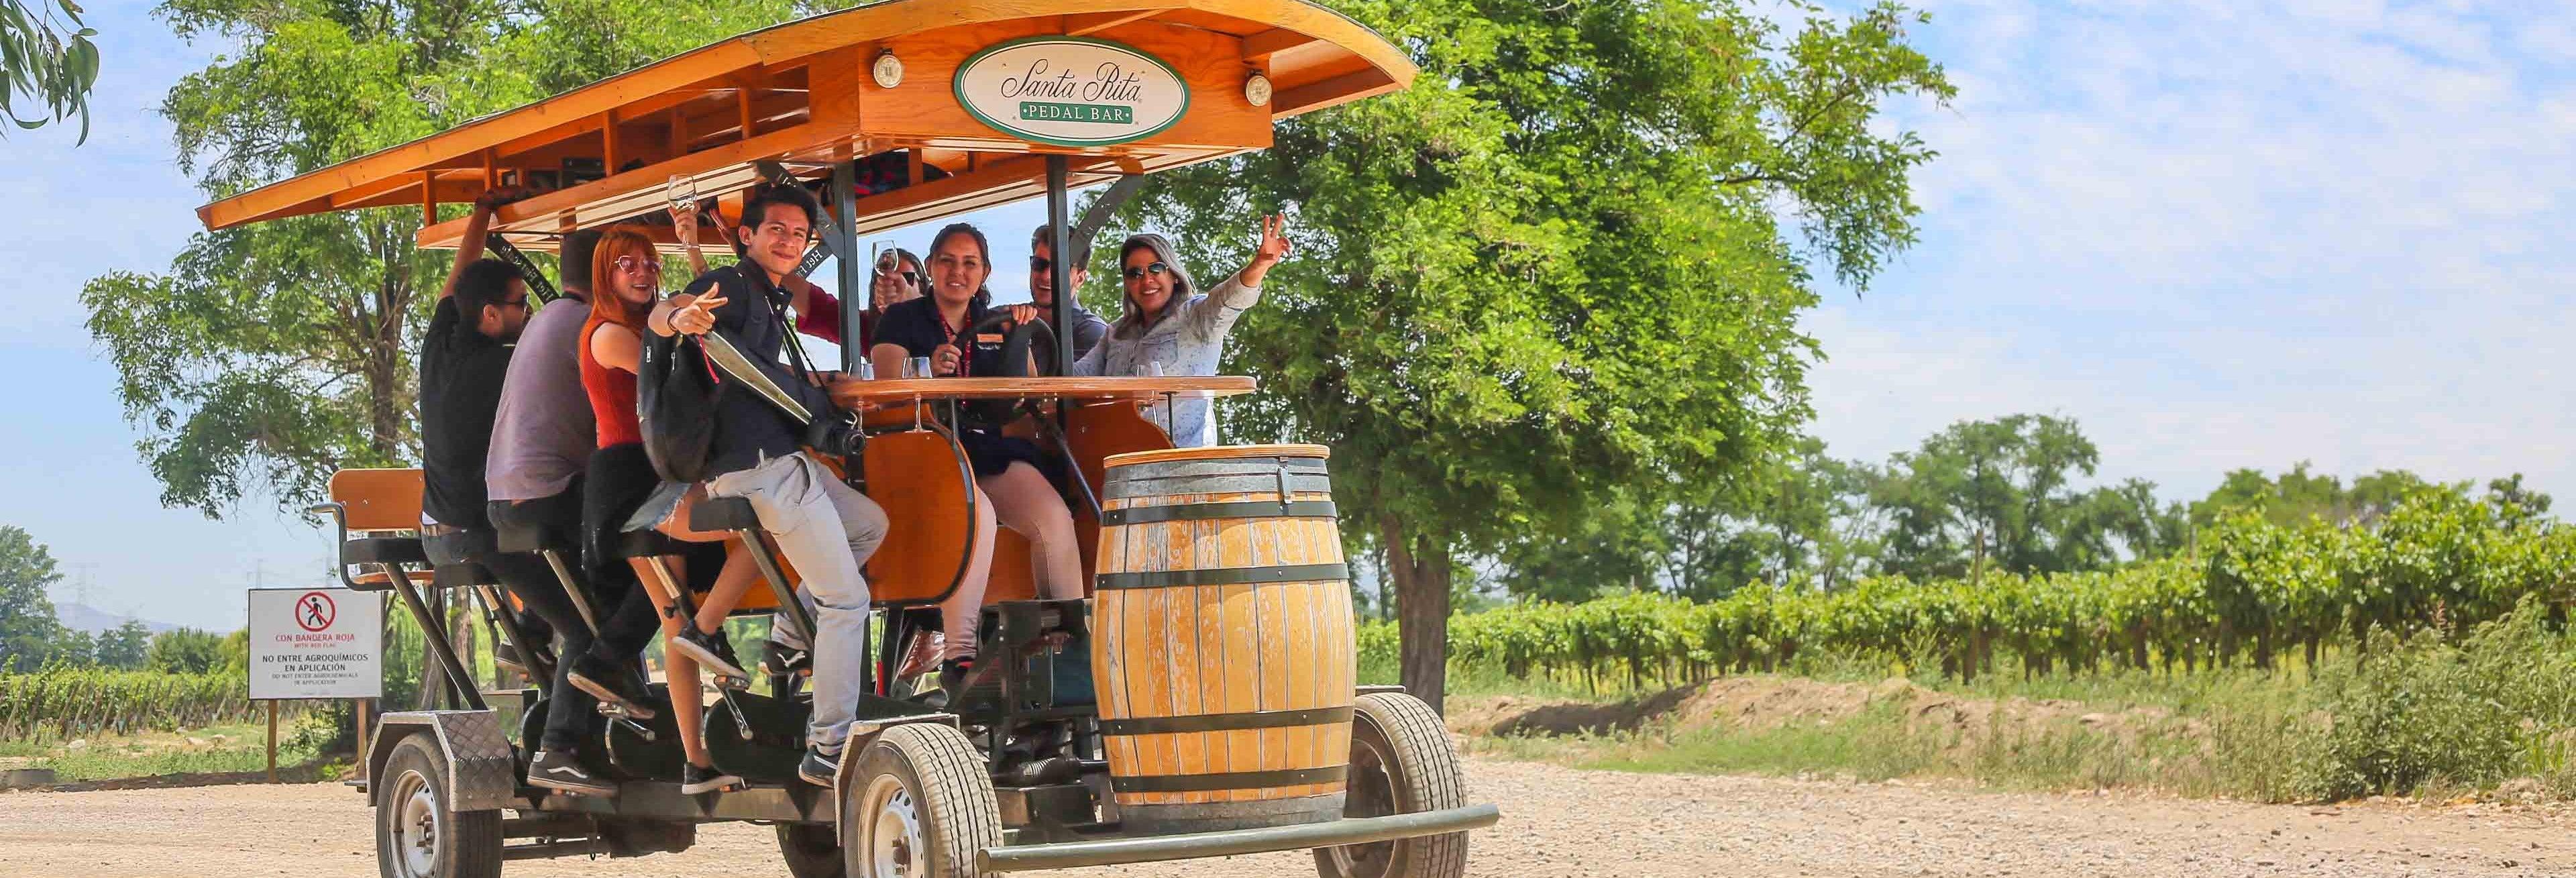 Tour en pedal bar por la bodega Viña Santa Rita